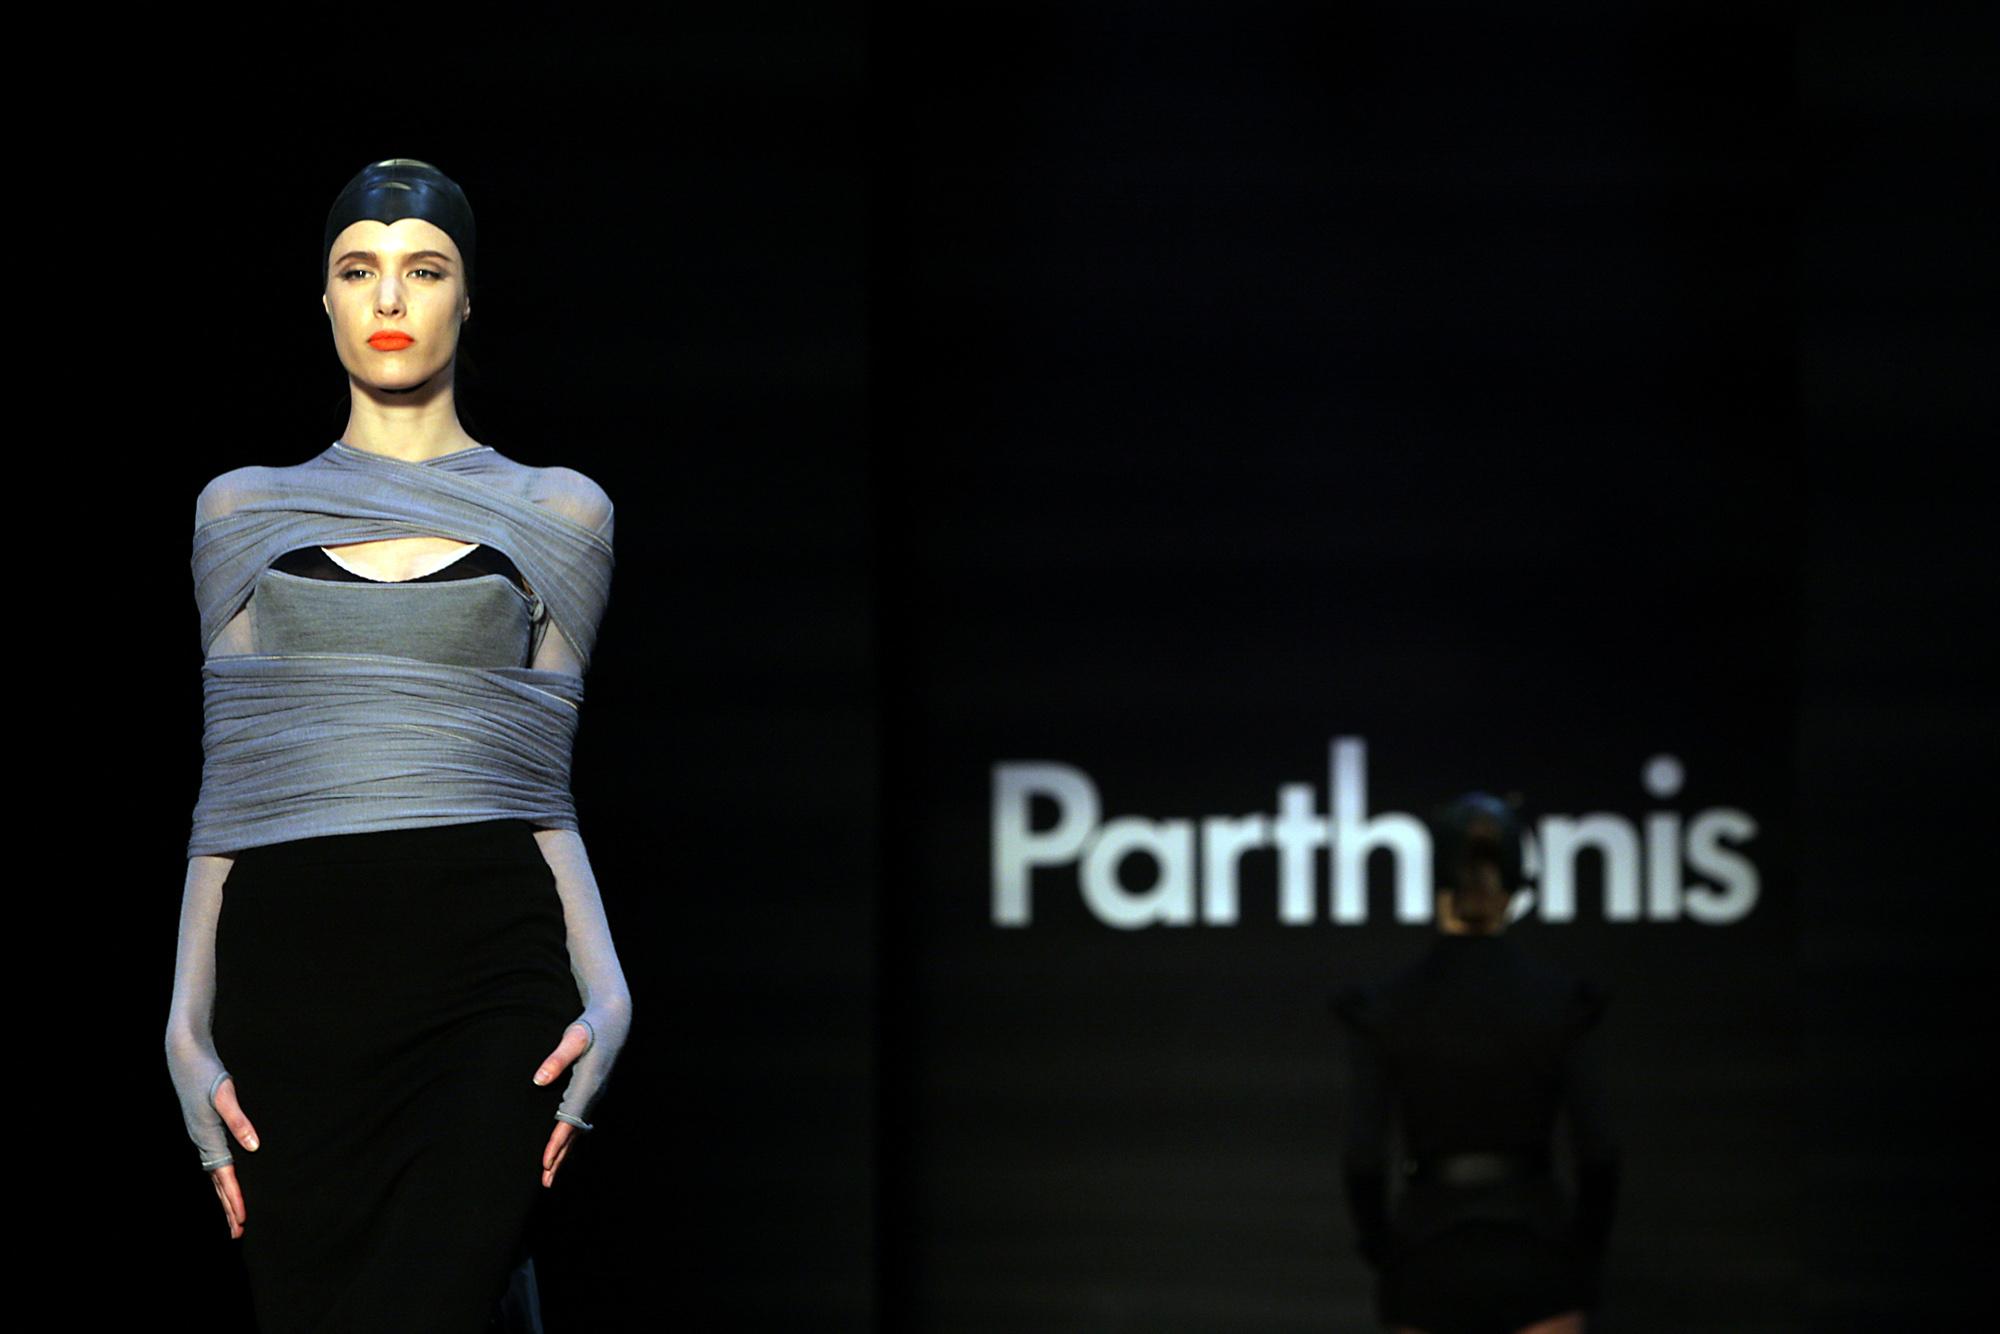 Parthenis_064